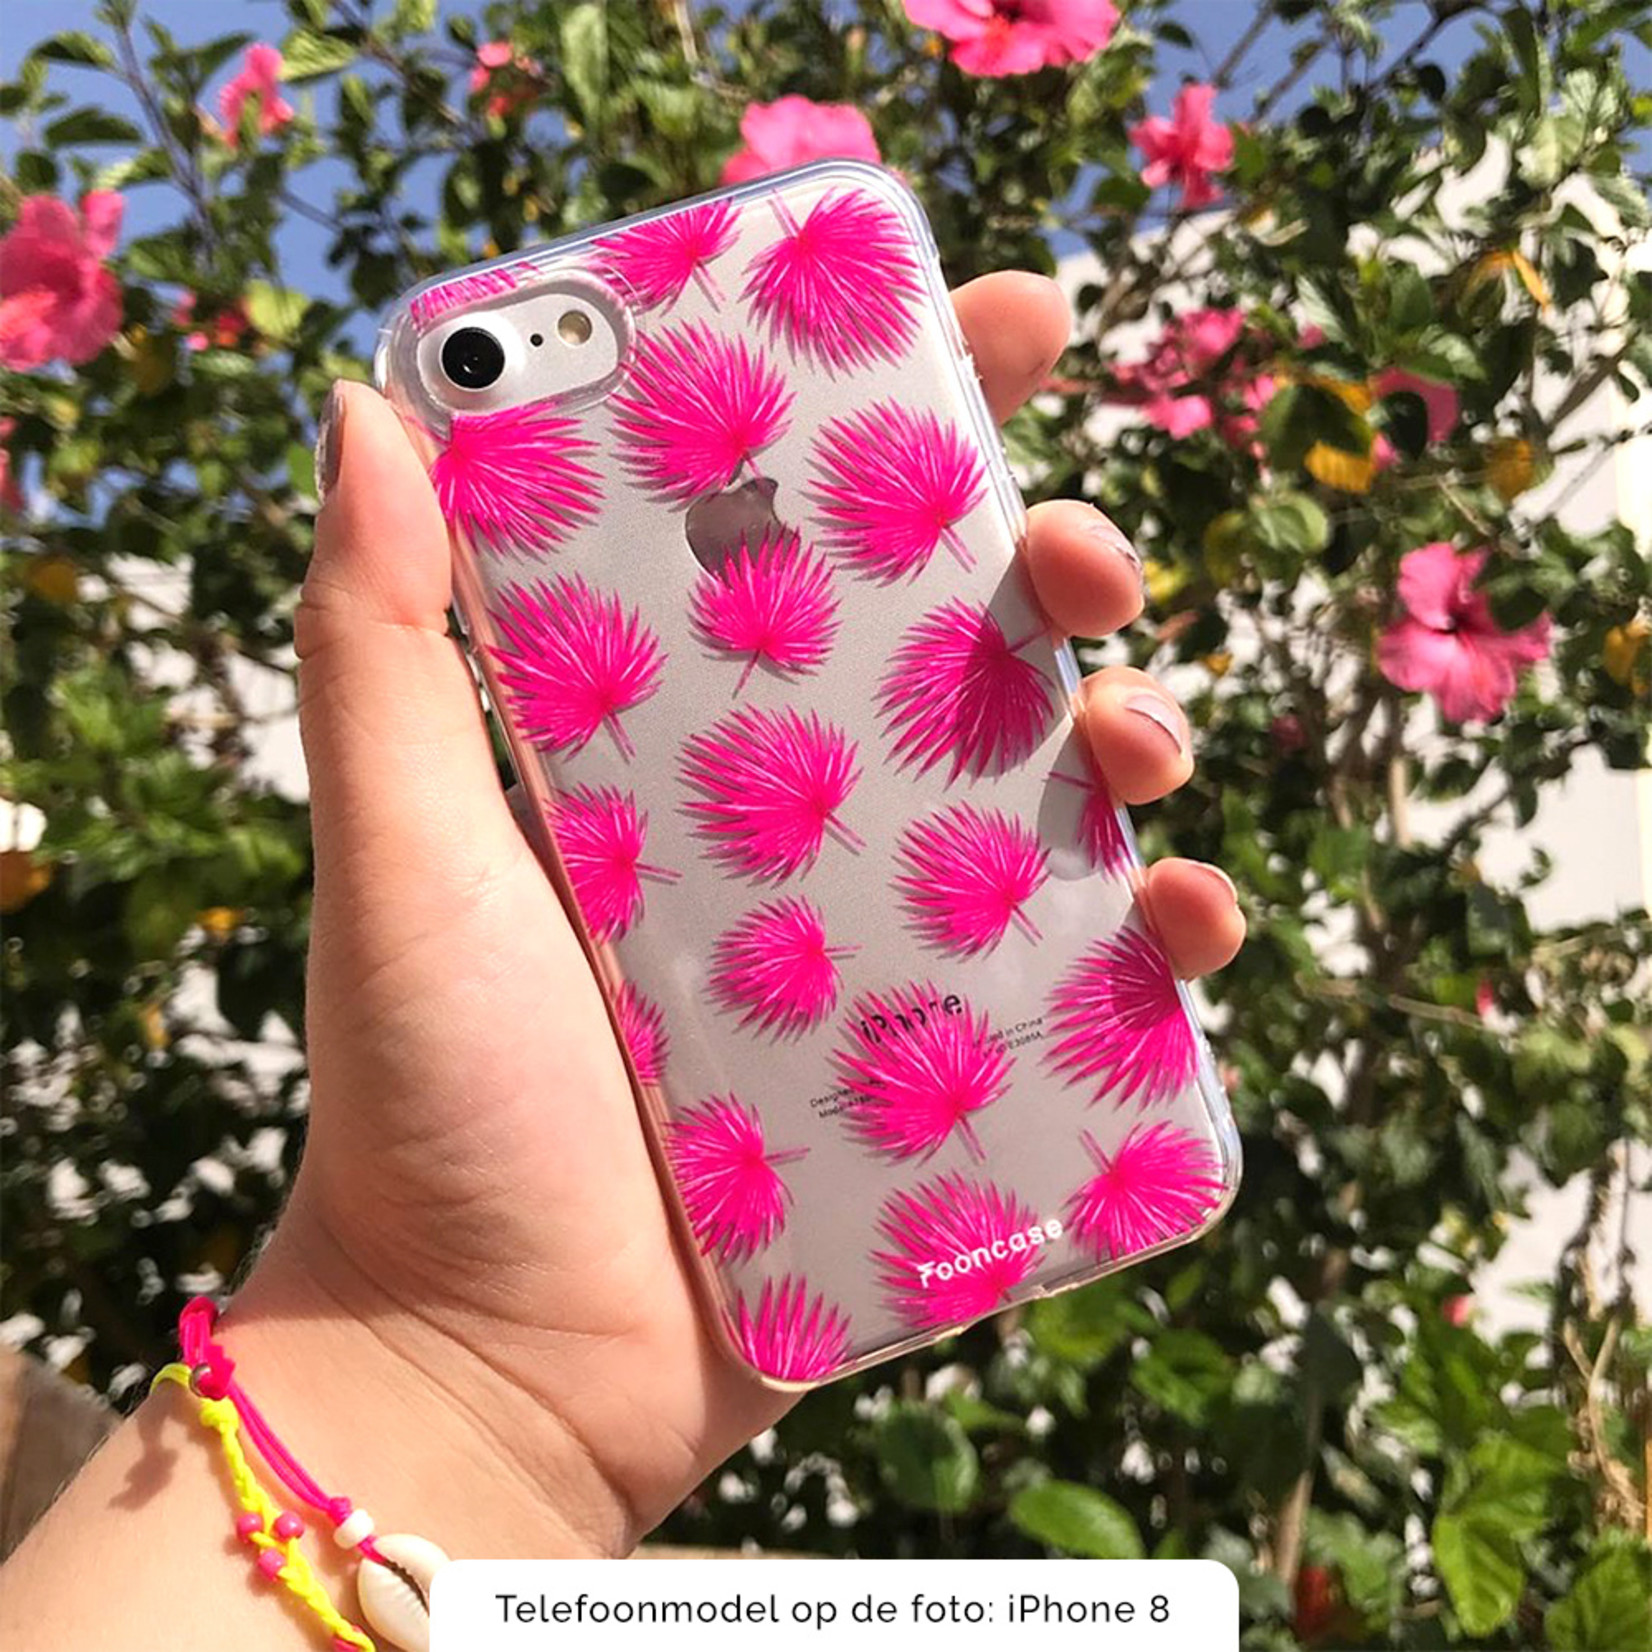 FOONCASE Huawei P8 Lite 2016 Handyhülle - Rosa Blätter